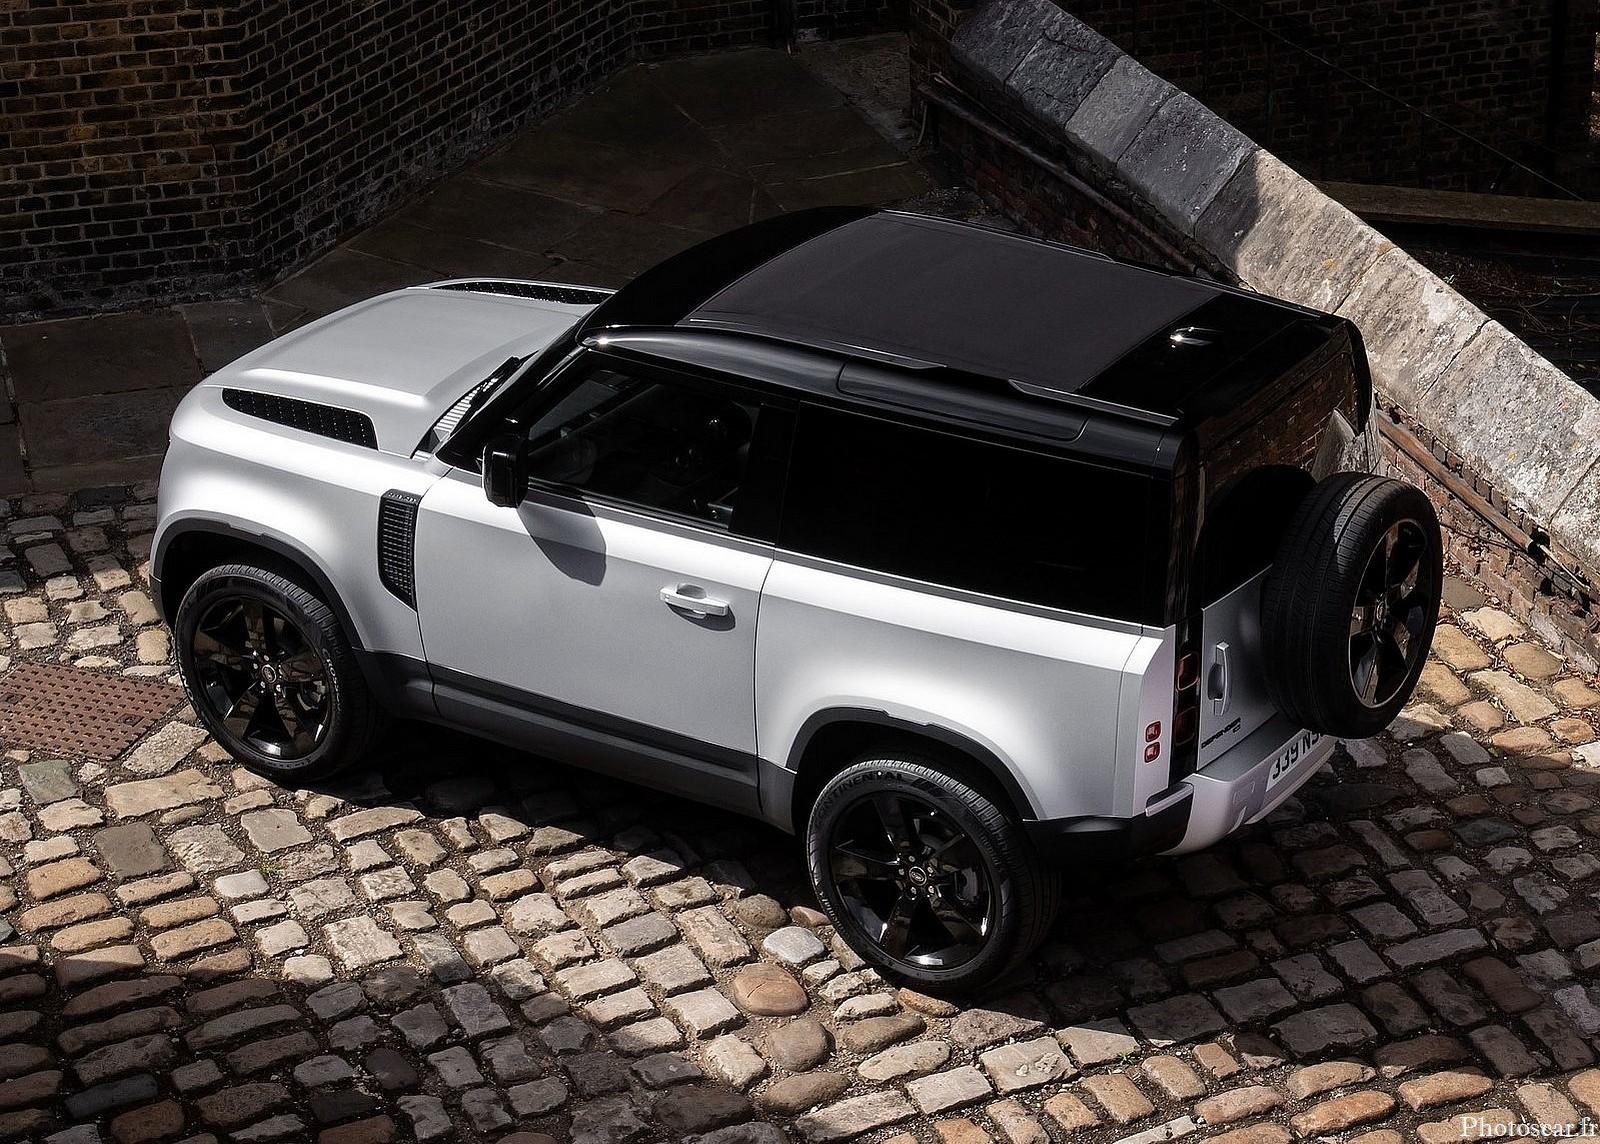 Land Rover Defender 90 2021 technologie tout-terrain ...